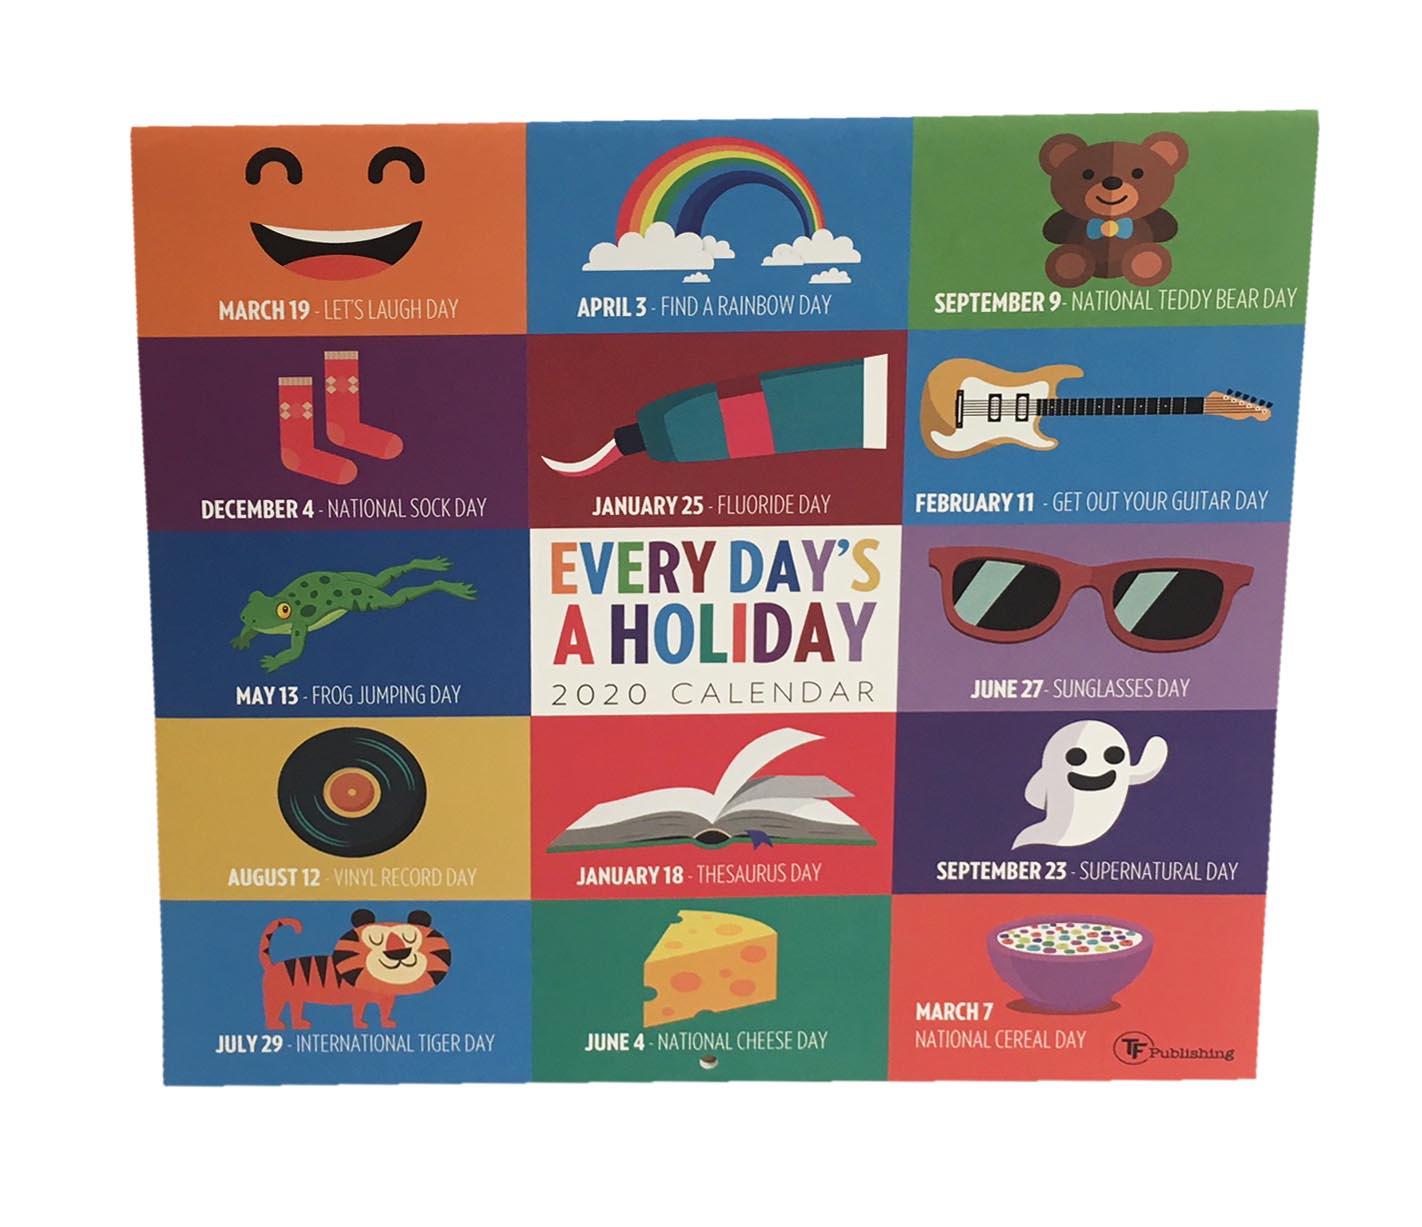 Every Day'S A Holiday Calendar | Kleertech intended for Every Day Holiday Calendar